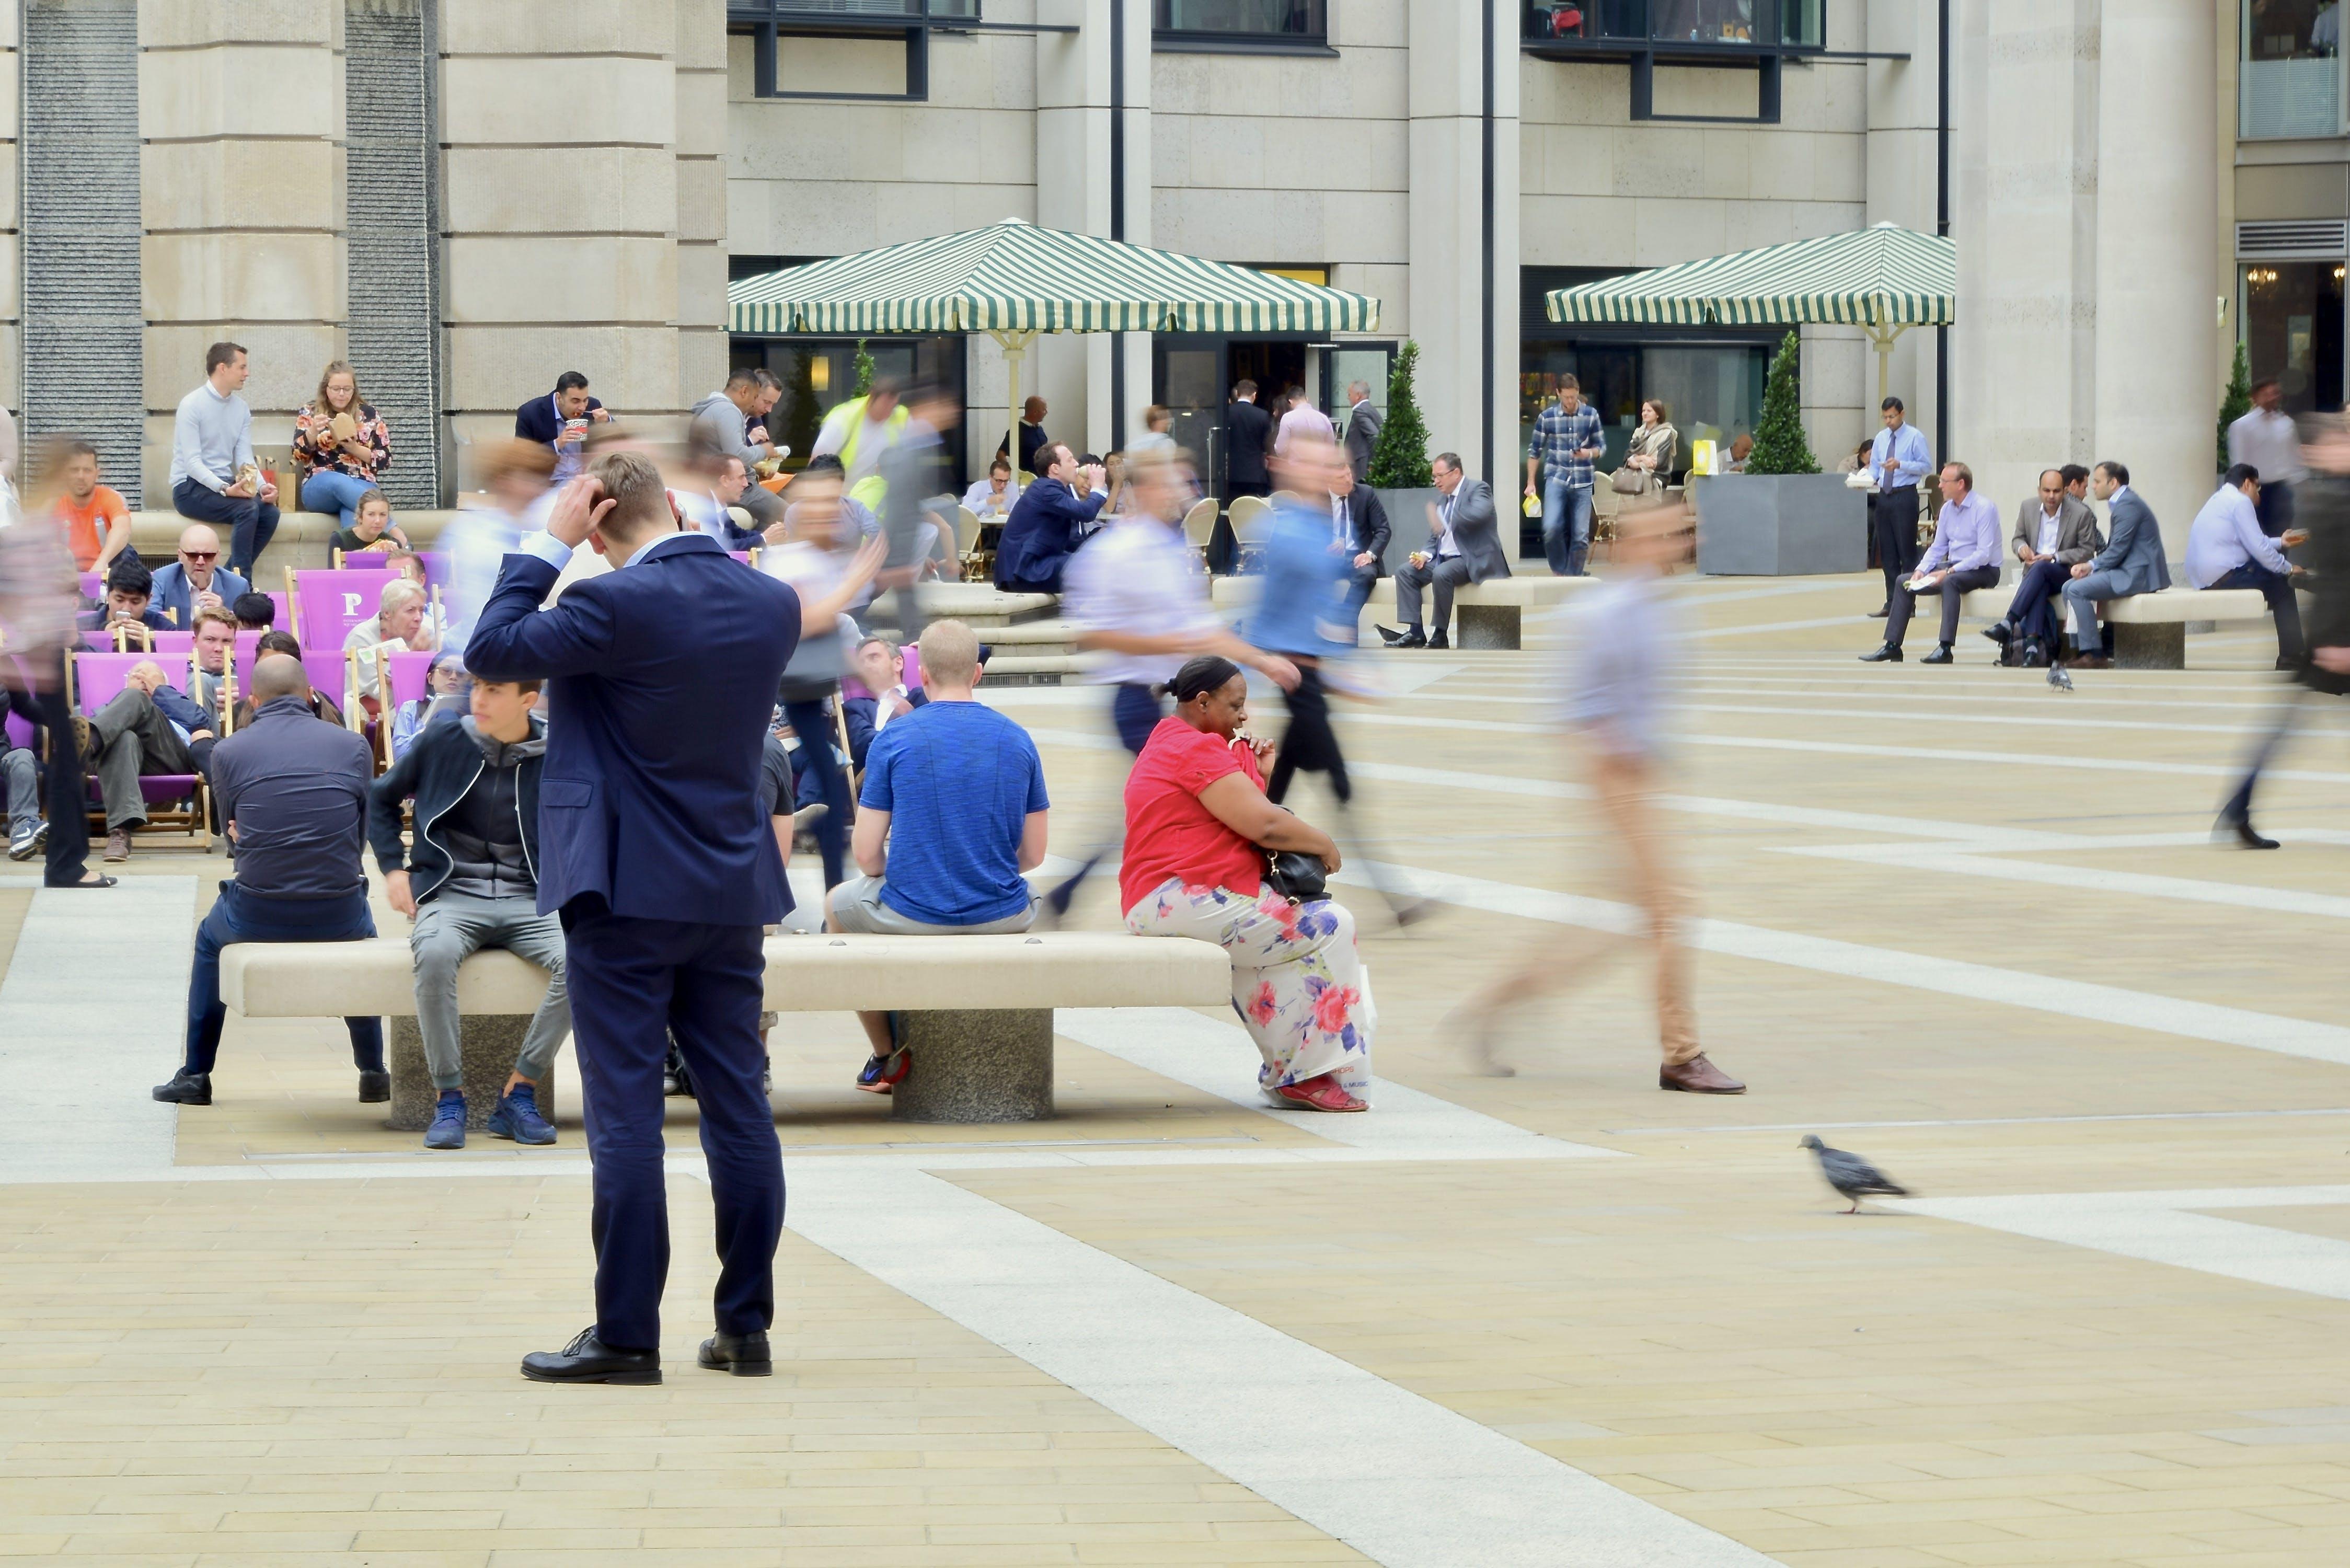 Man Wearing Blue Suit on Beige Ground Near Building